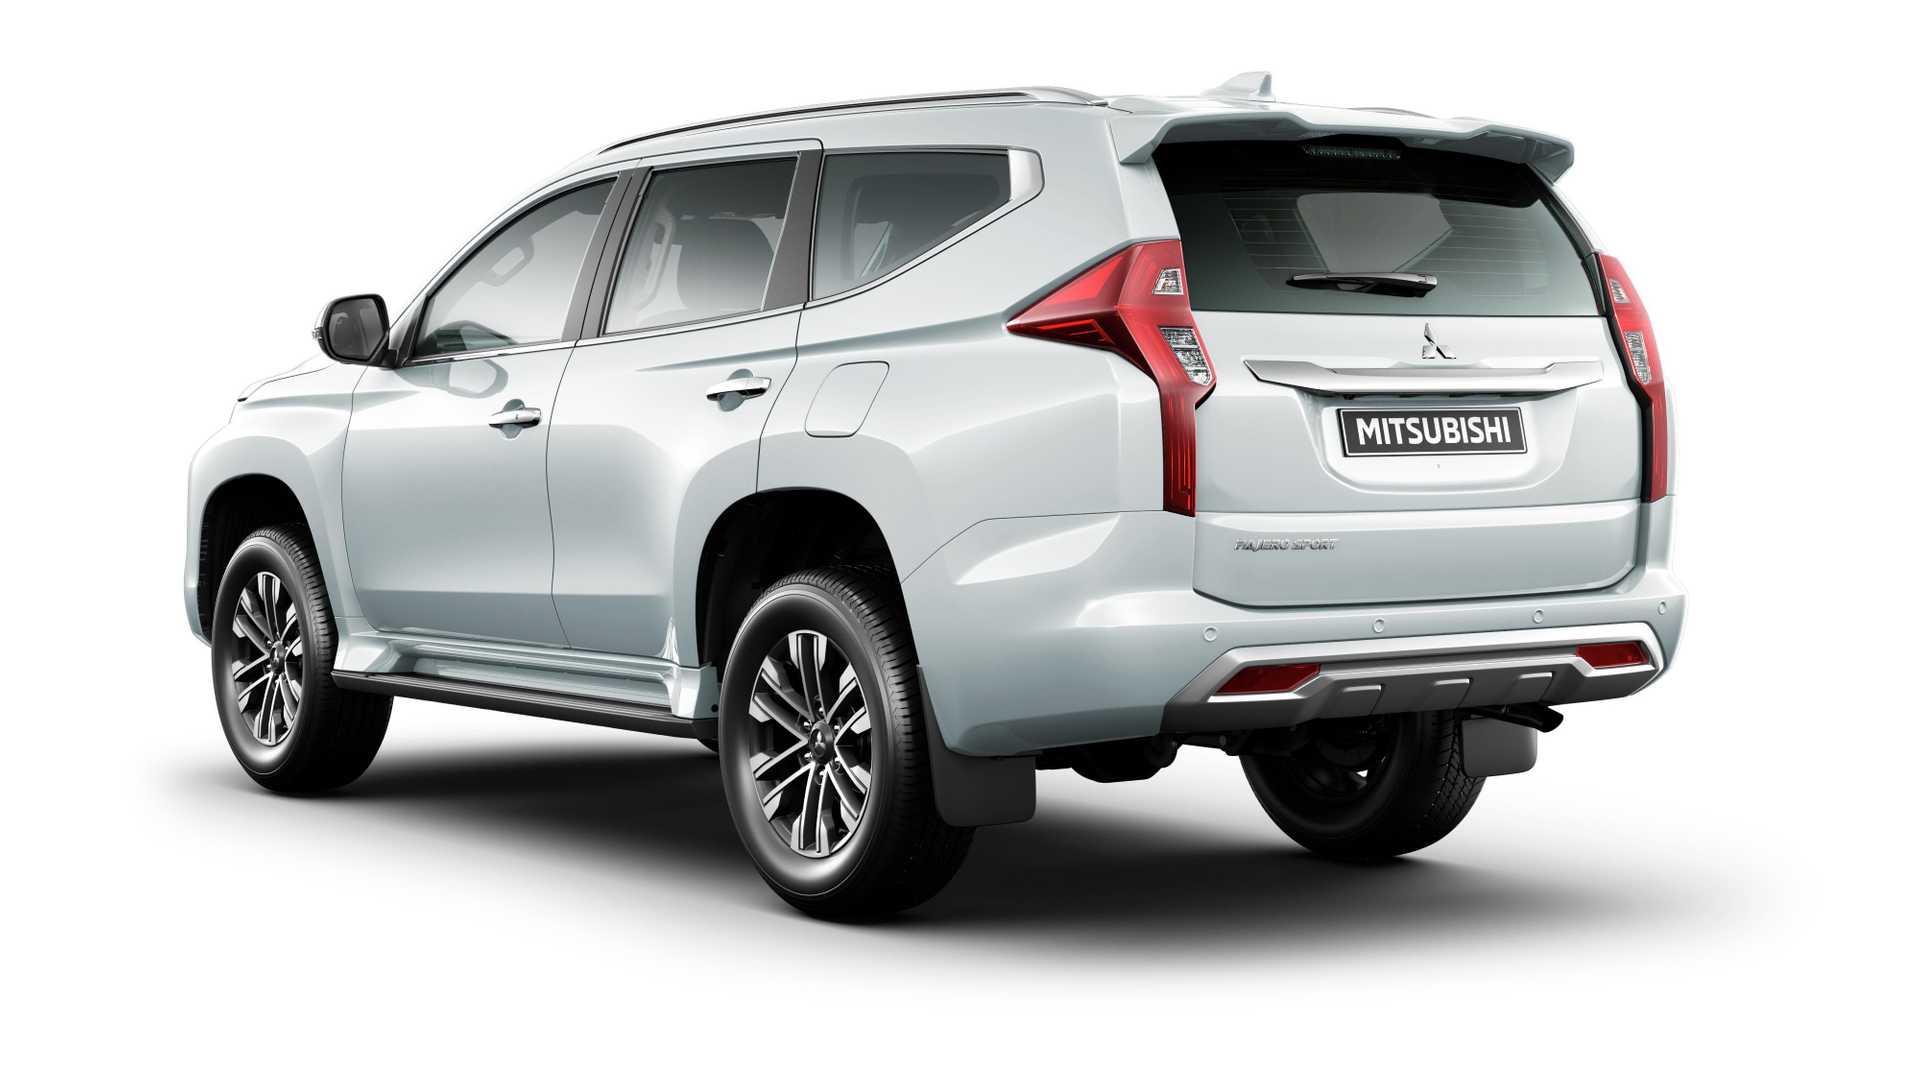 2020_Mitsubishi_Pajero_Sport_facelift_0022